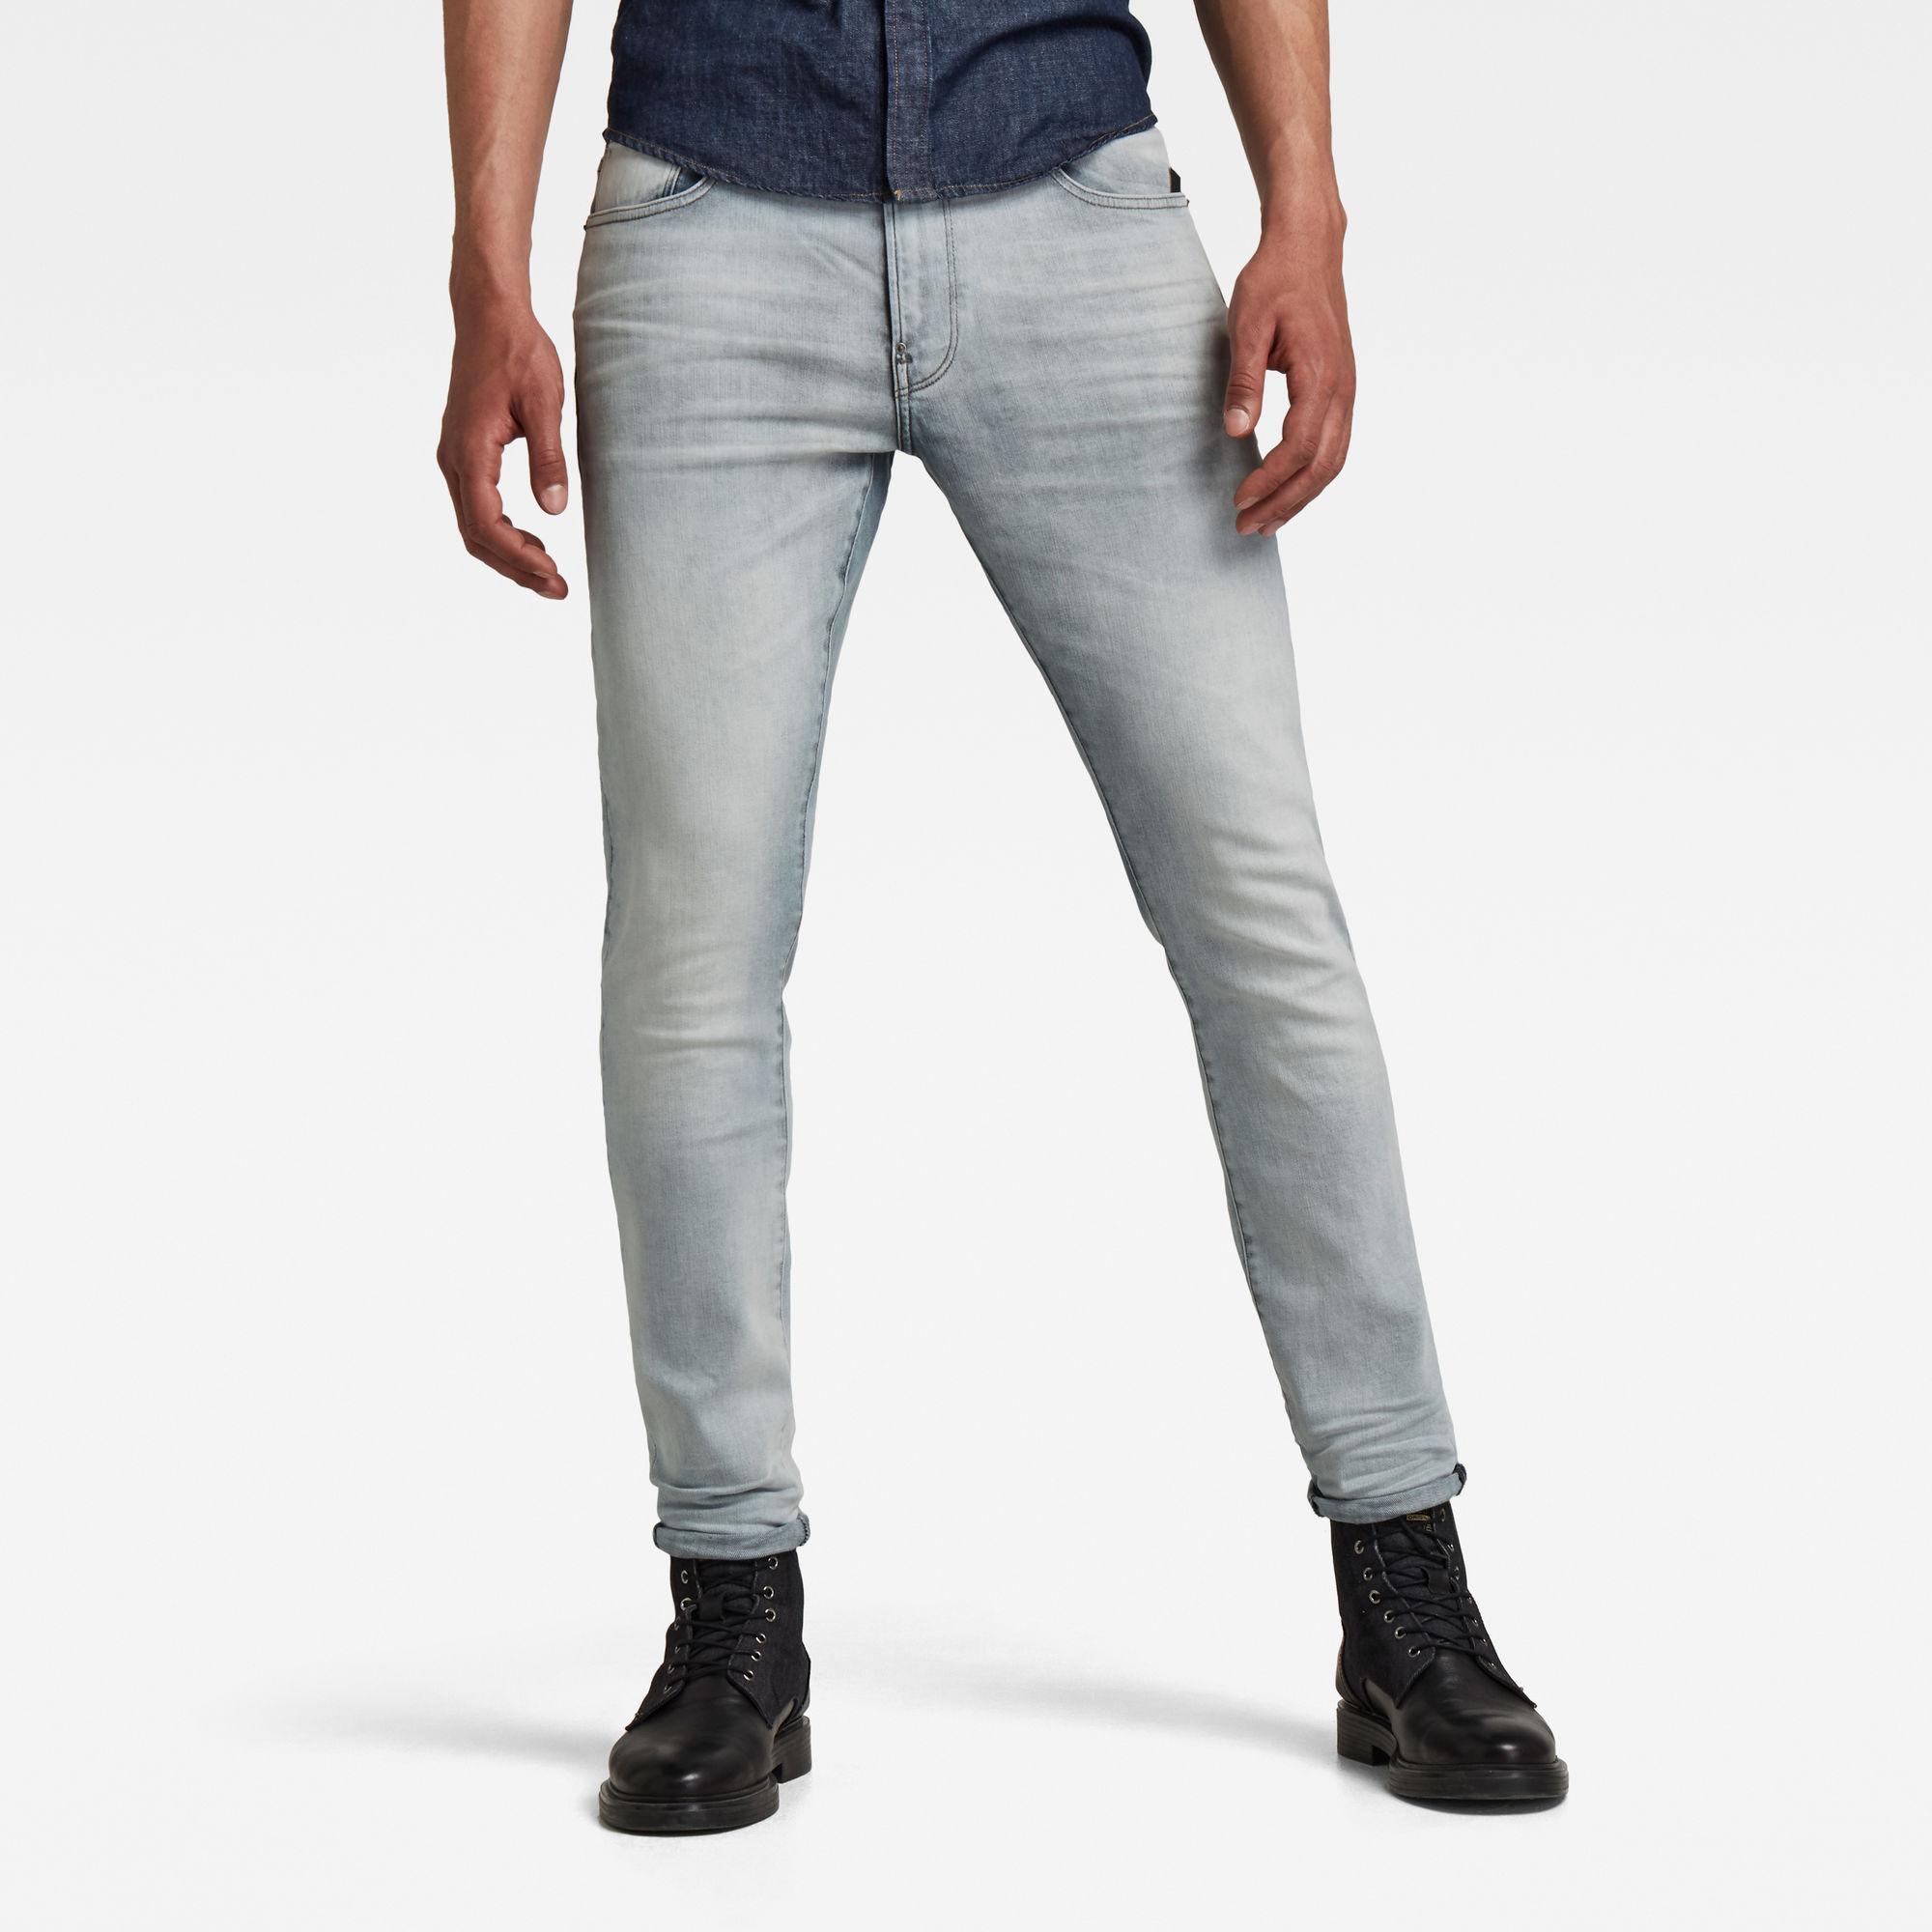 G-Star RAW Heren Revend Skinny Jeans Lichtblauw